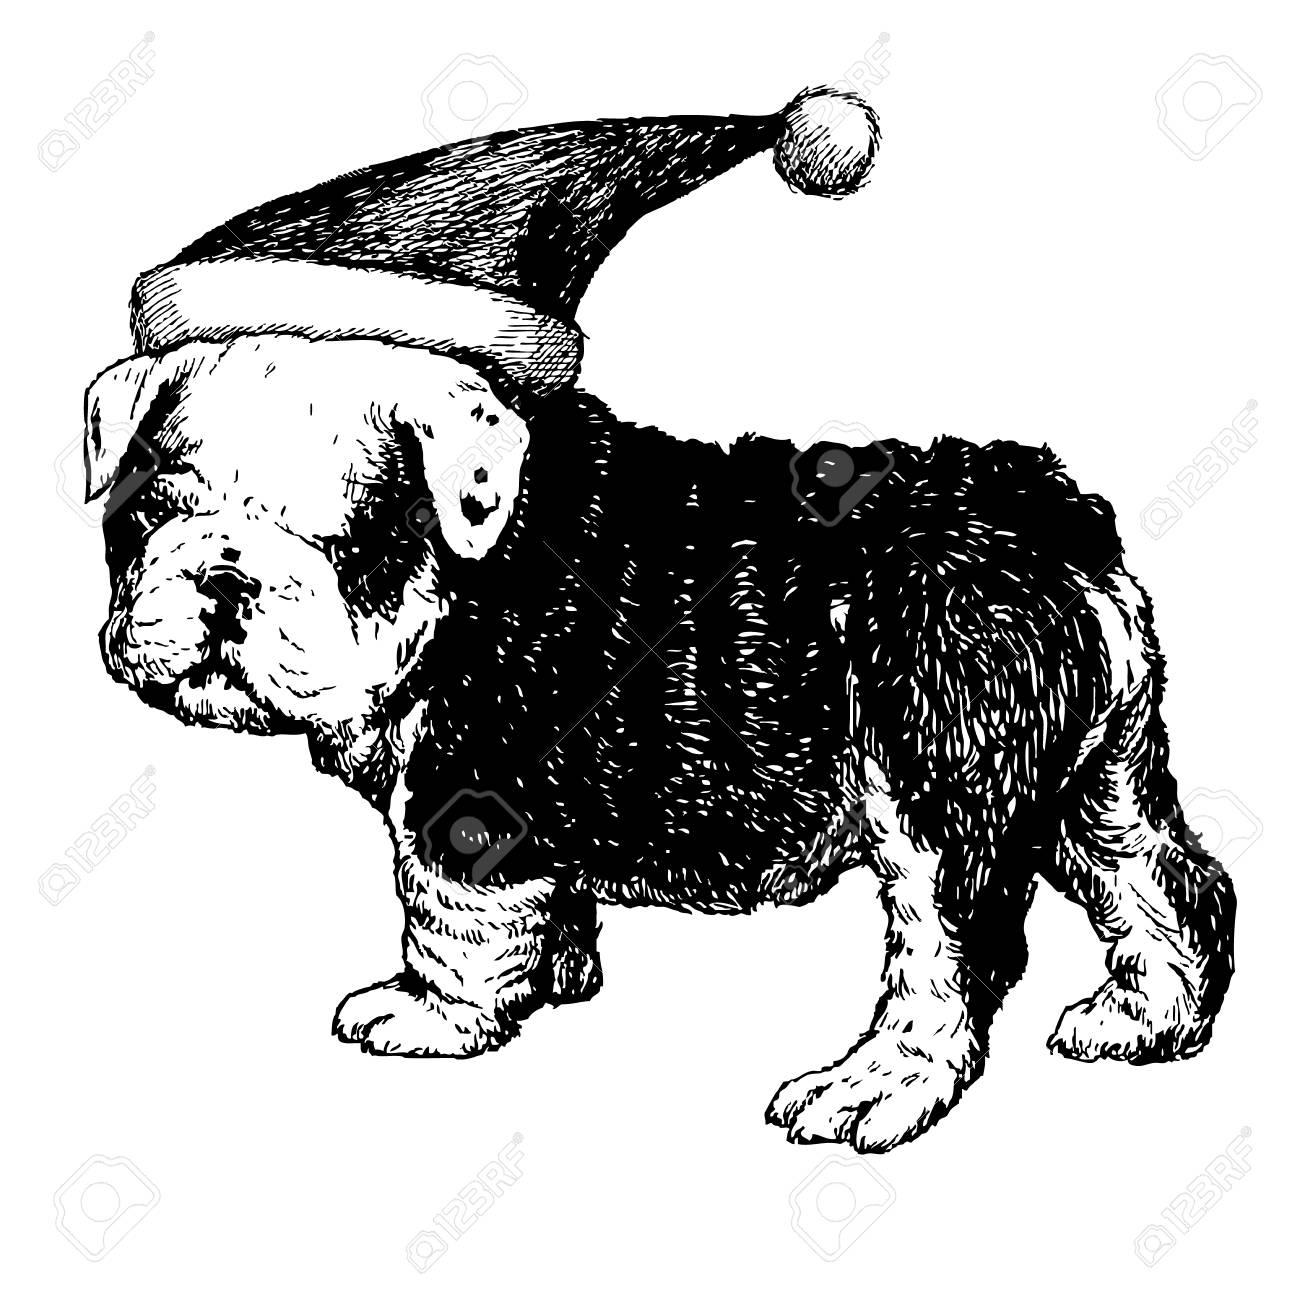 1300x1300 Freehand Sketch Illustration Of Bulldog Dog With Christmas Santa